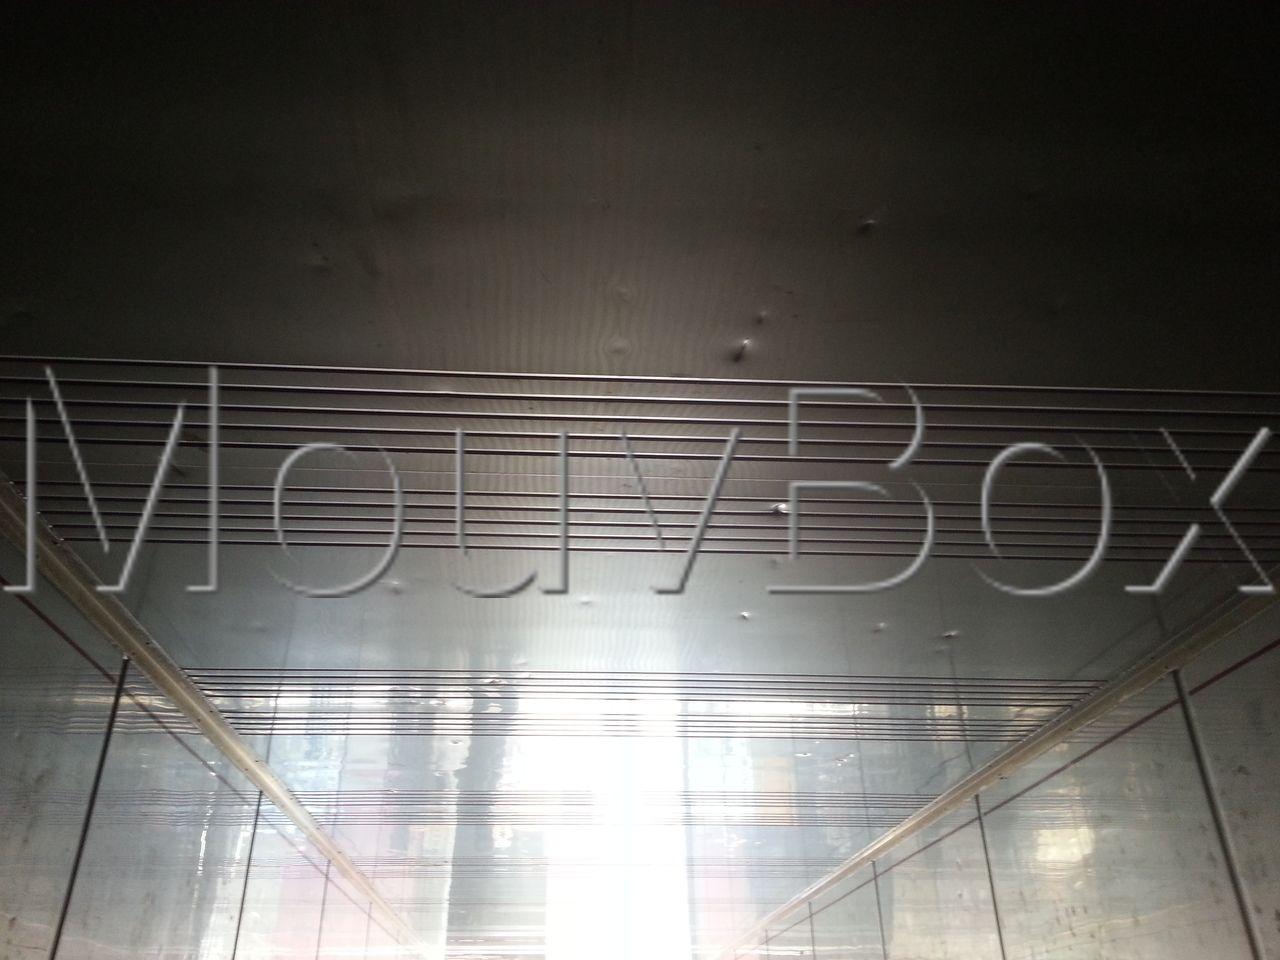 container-conteneur-box-caisson-reefer-40ft-occasion-vente-mouvbox (3)